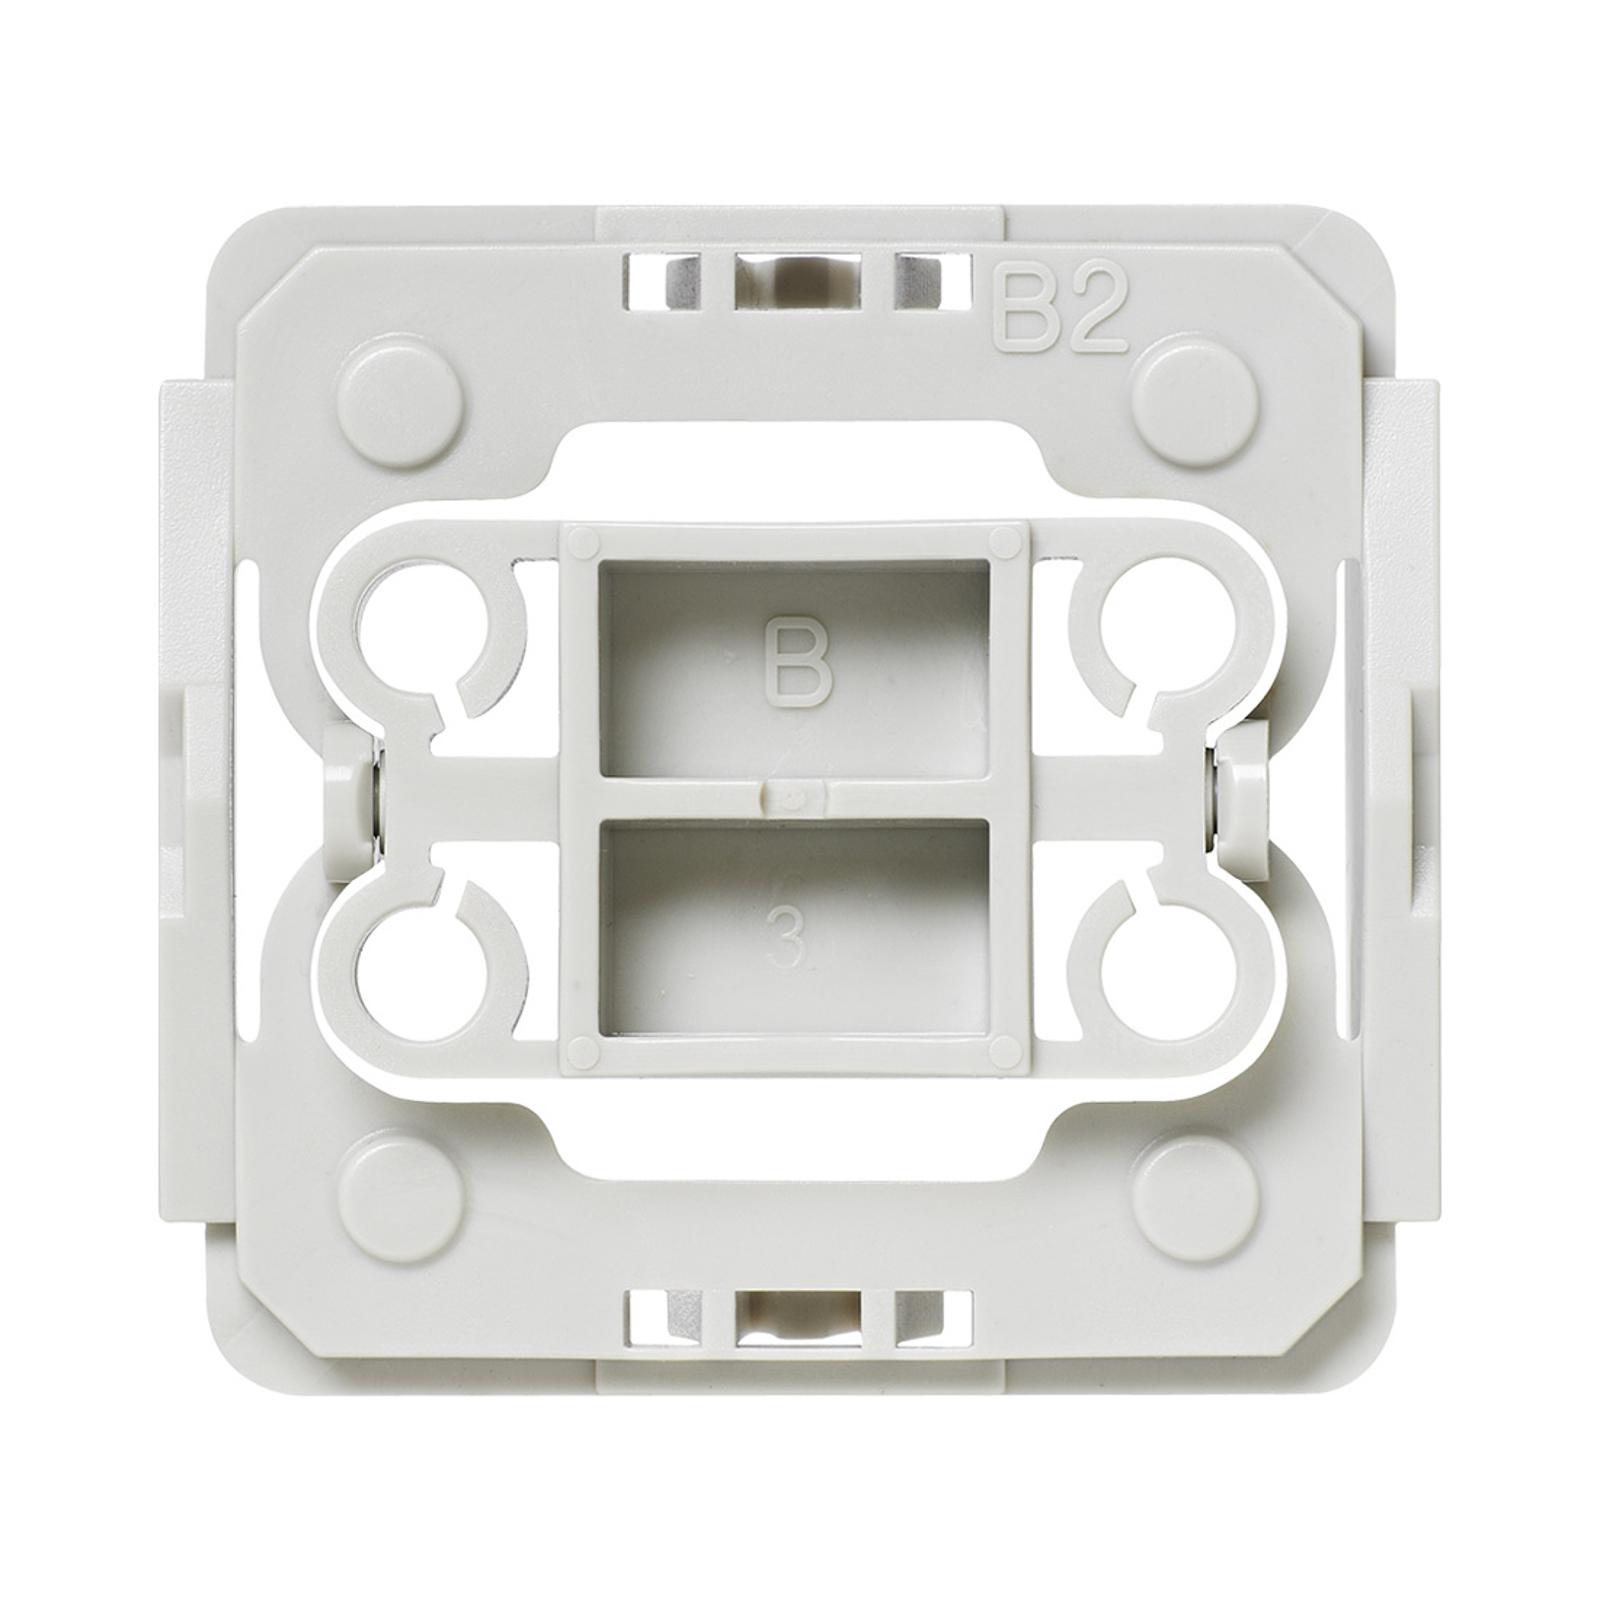 Homematic IP Adapter für Berker Schalter B2 1x